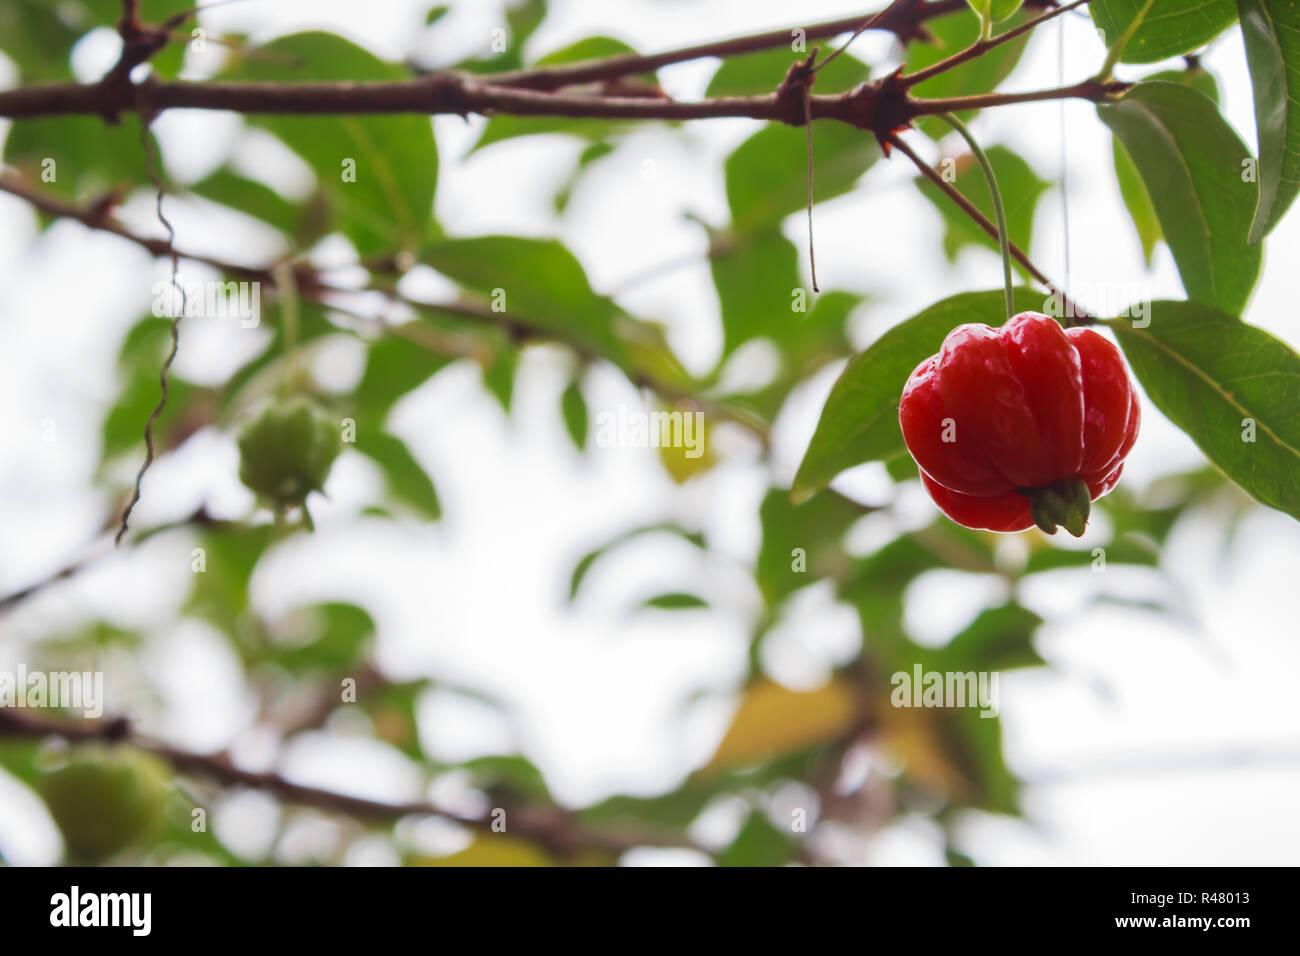 Fresh organic Acerola cherry on the tree, High vitamin C and antioxidant fruits - Stock Image